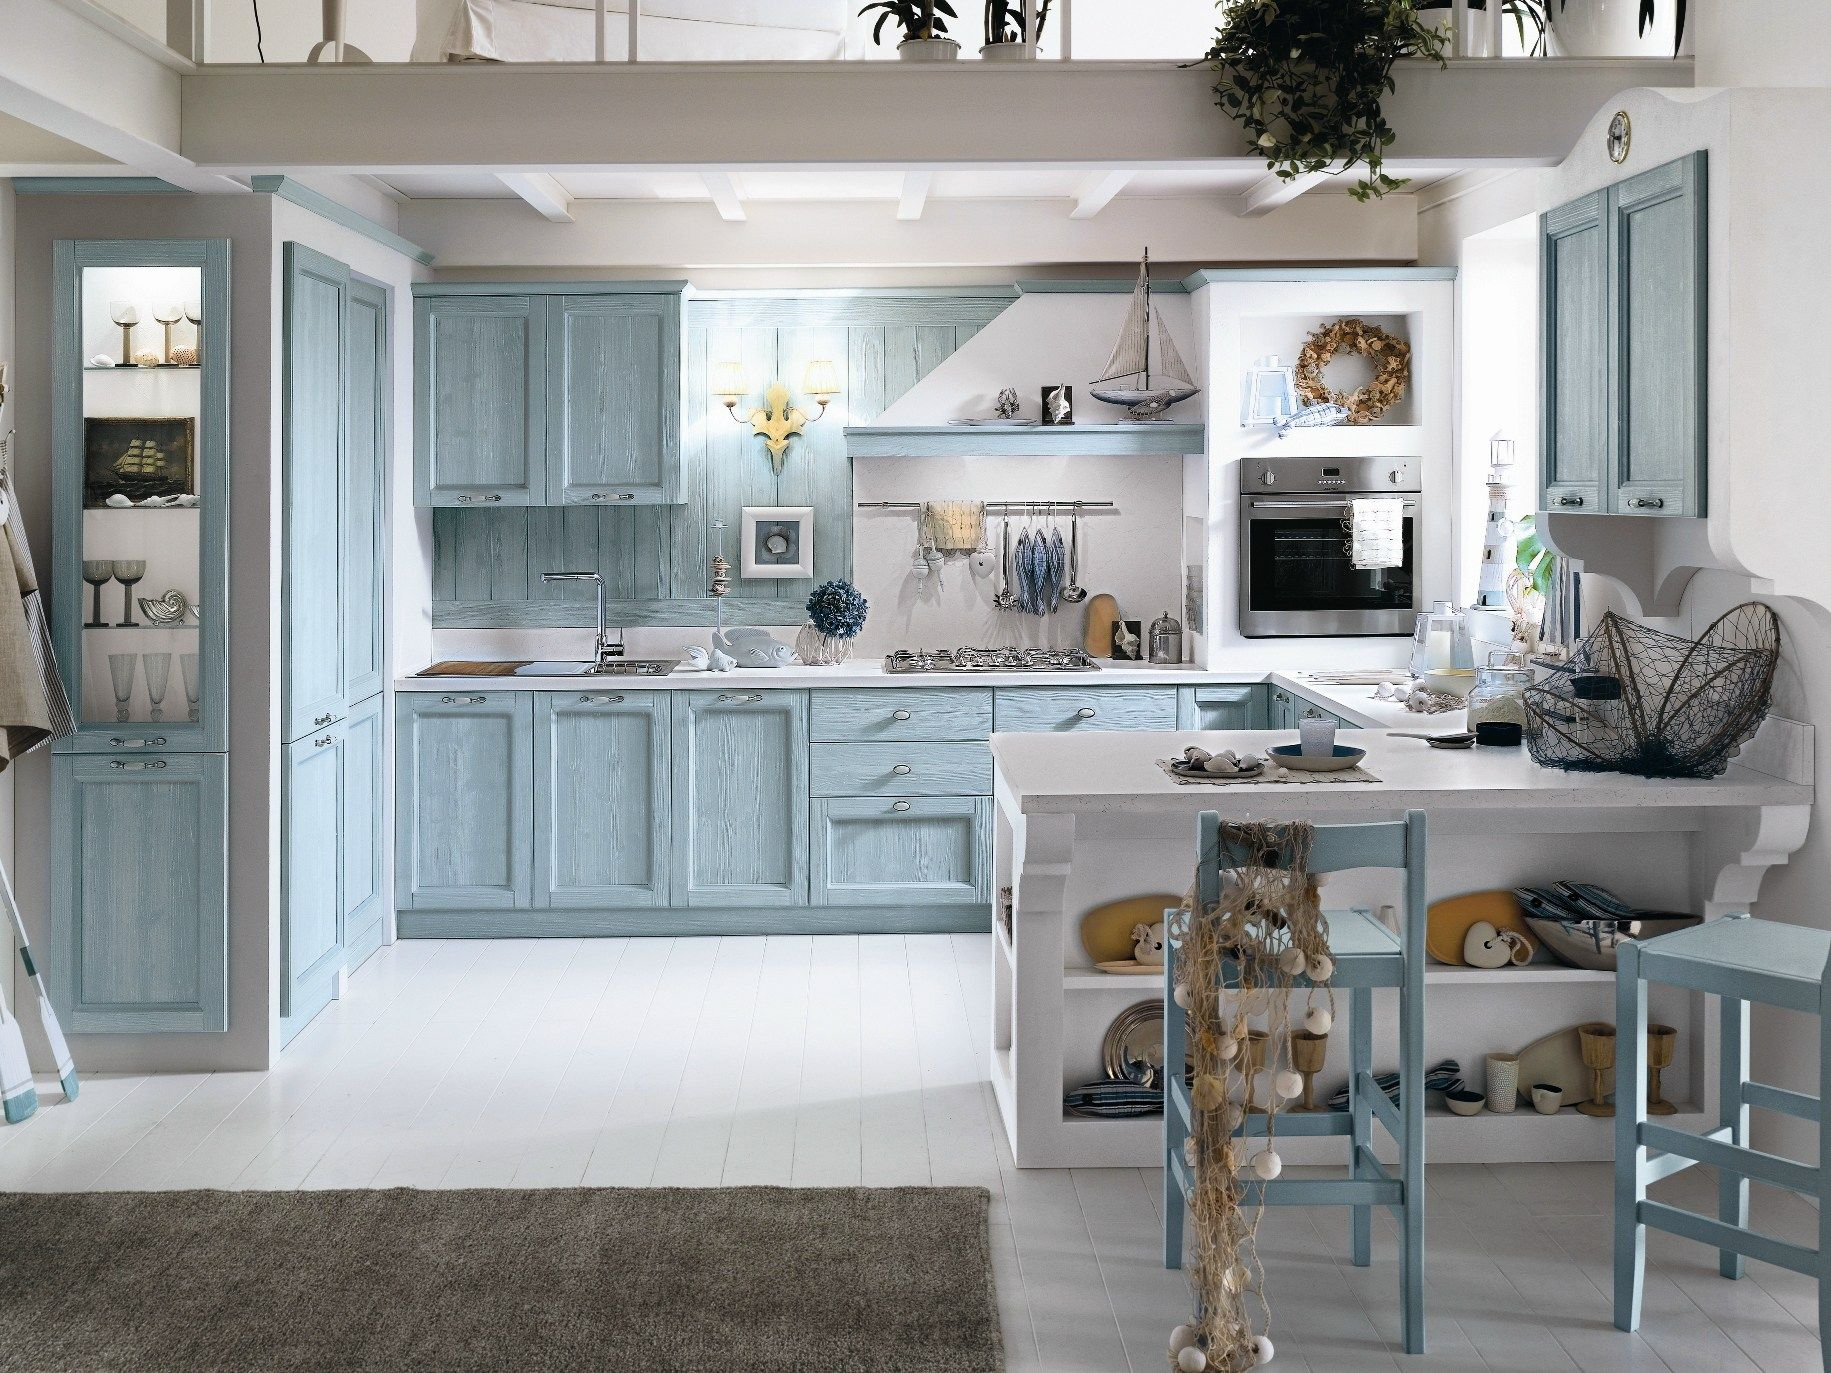 EVERY DAY Kitchen with peninsula by Callesella Arredamenti | kitchen ...